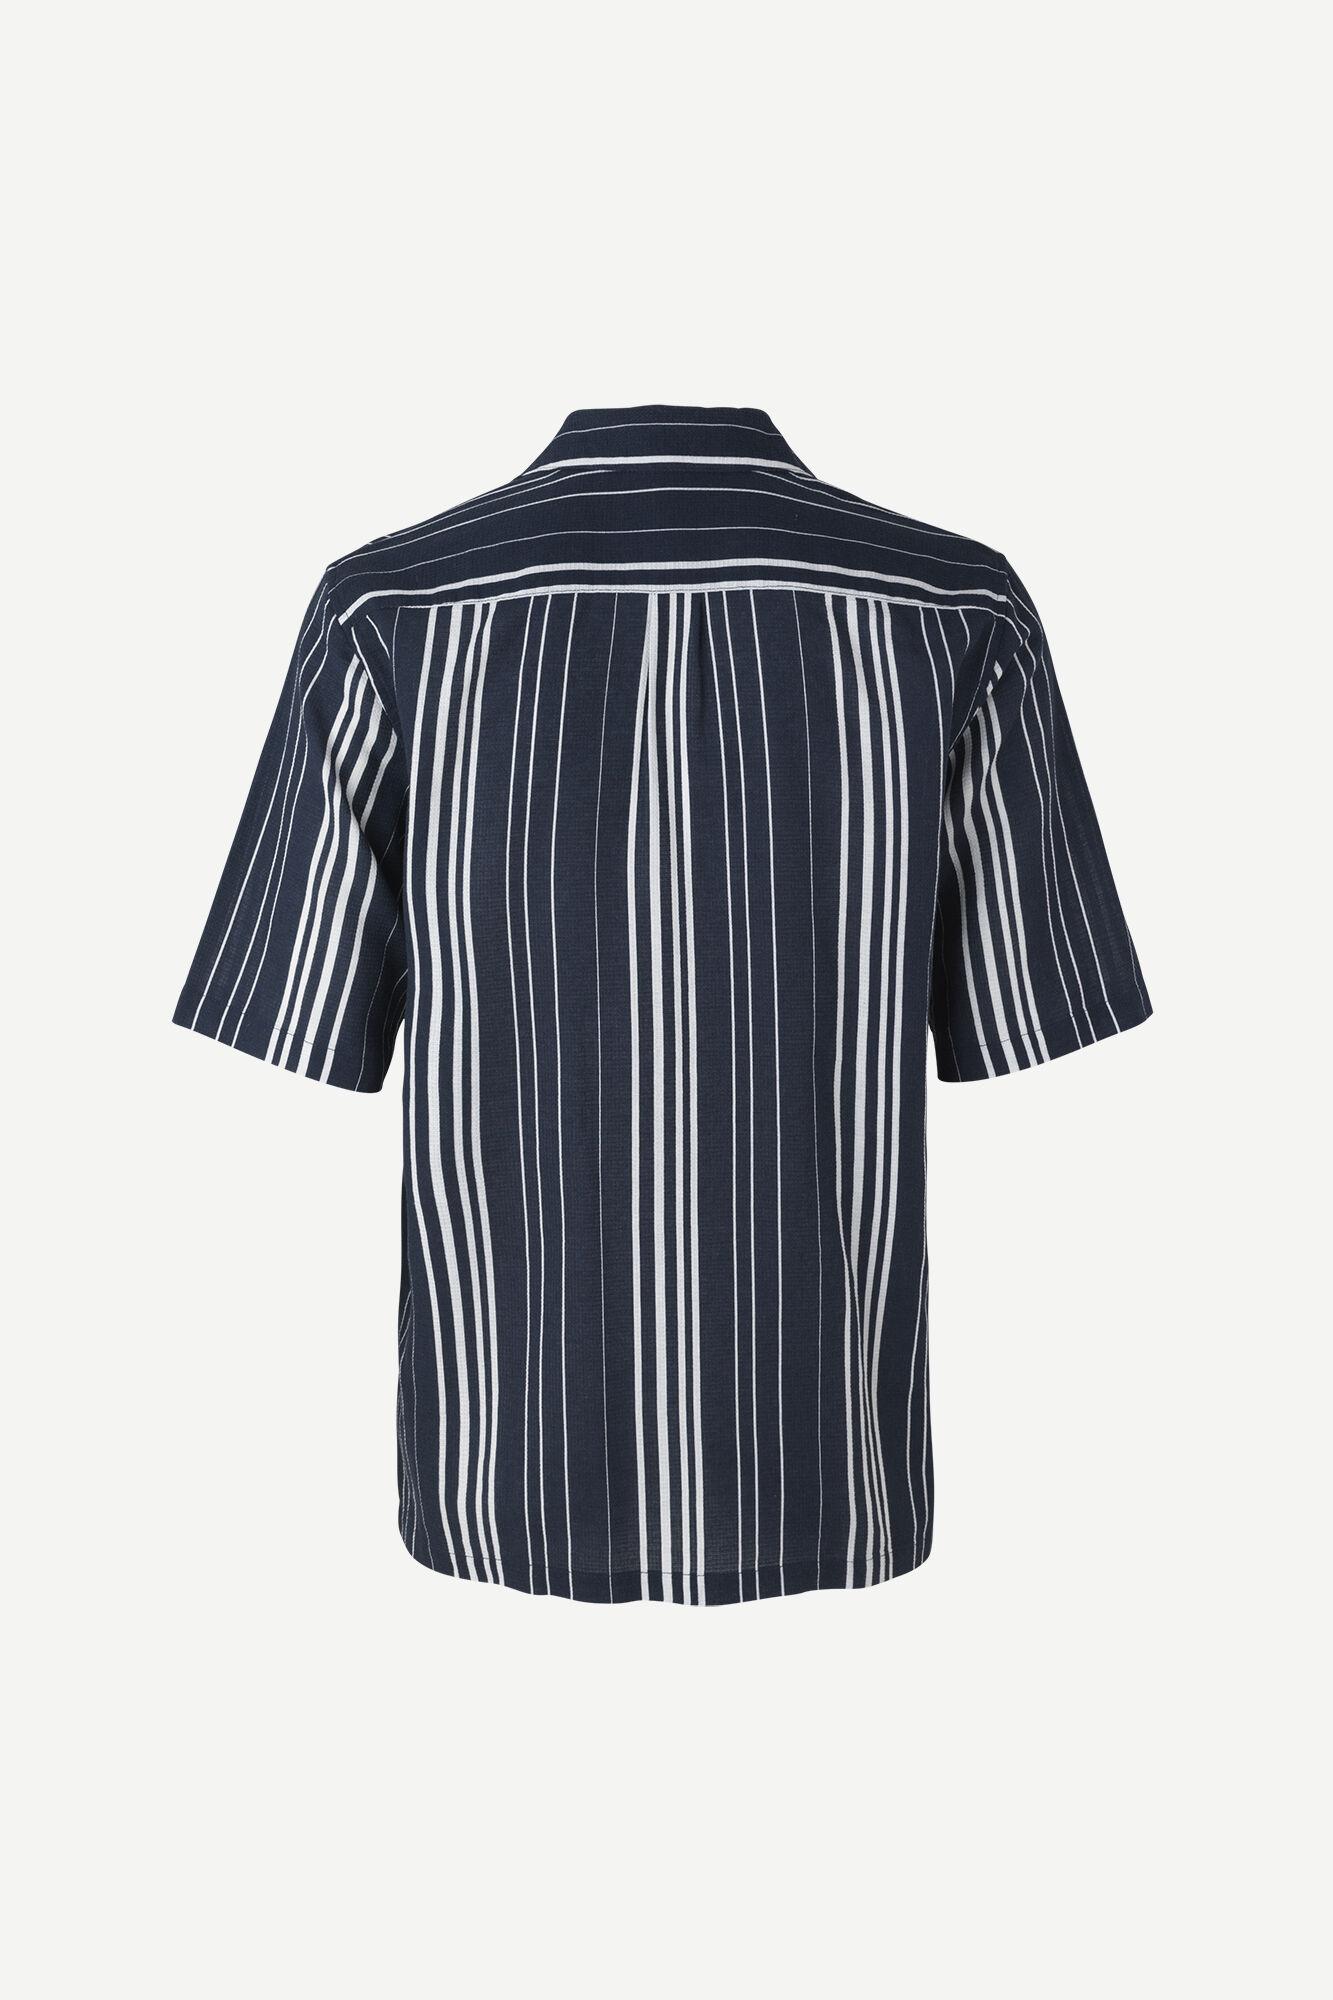 Oscar AC shirt 11528